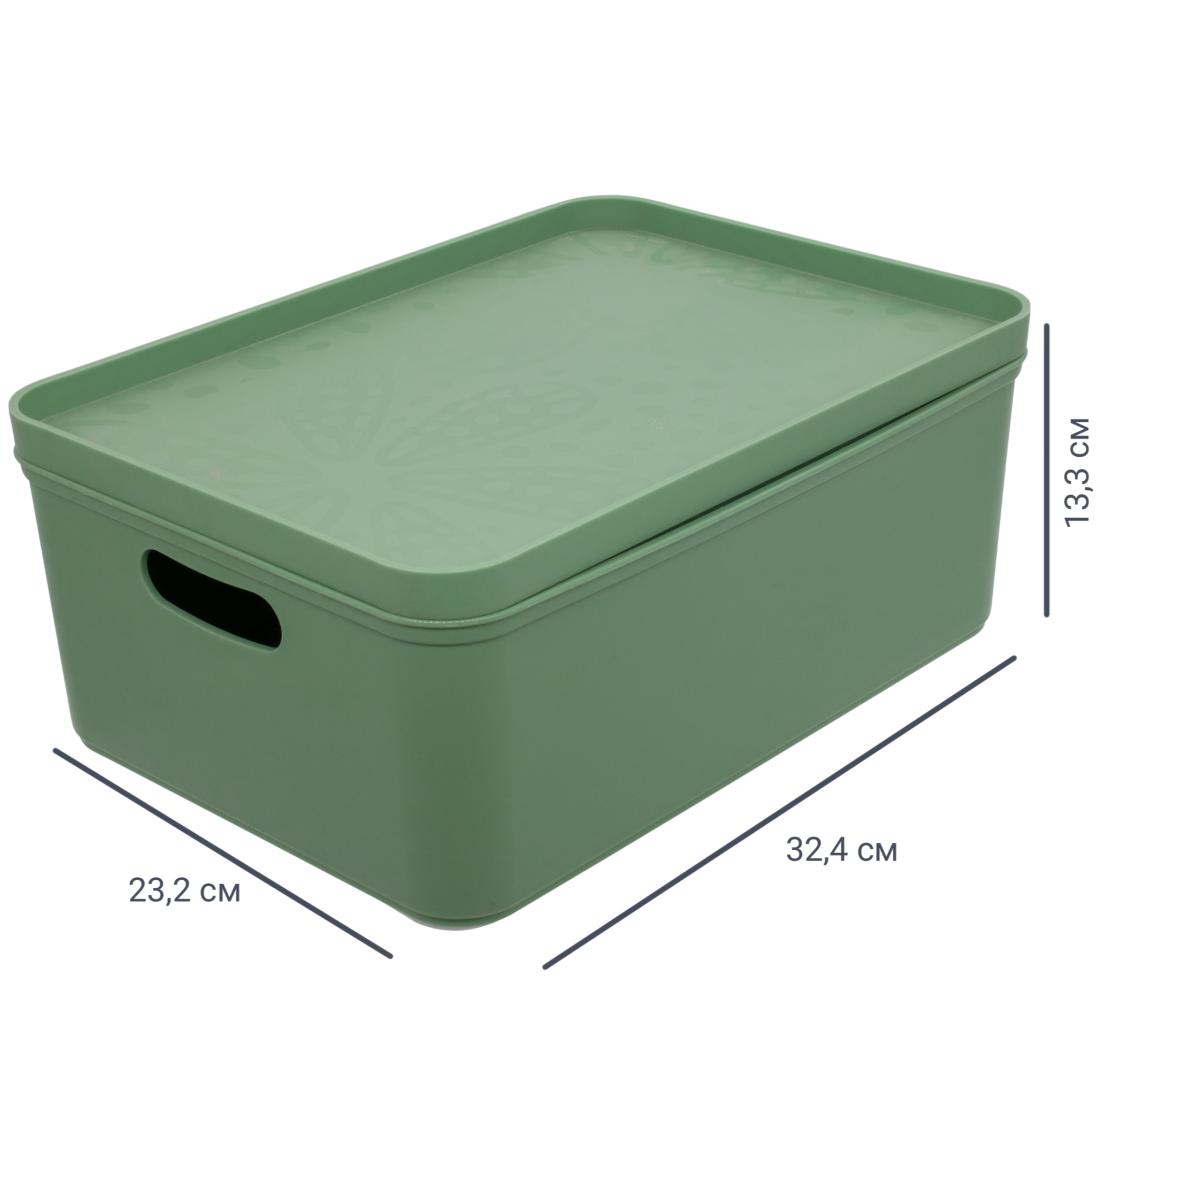 Органайзер Для Хранения Berossi 23Х13Х32 Цвет Зеленый